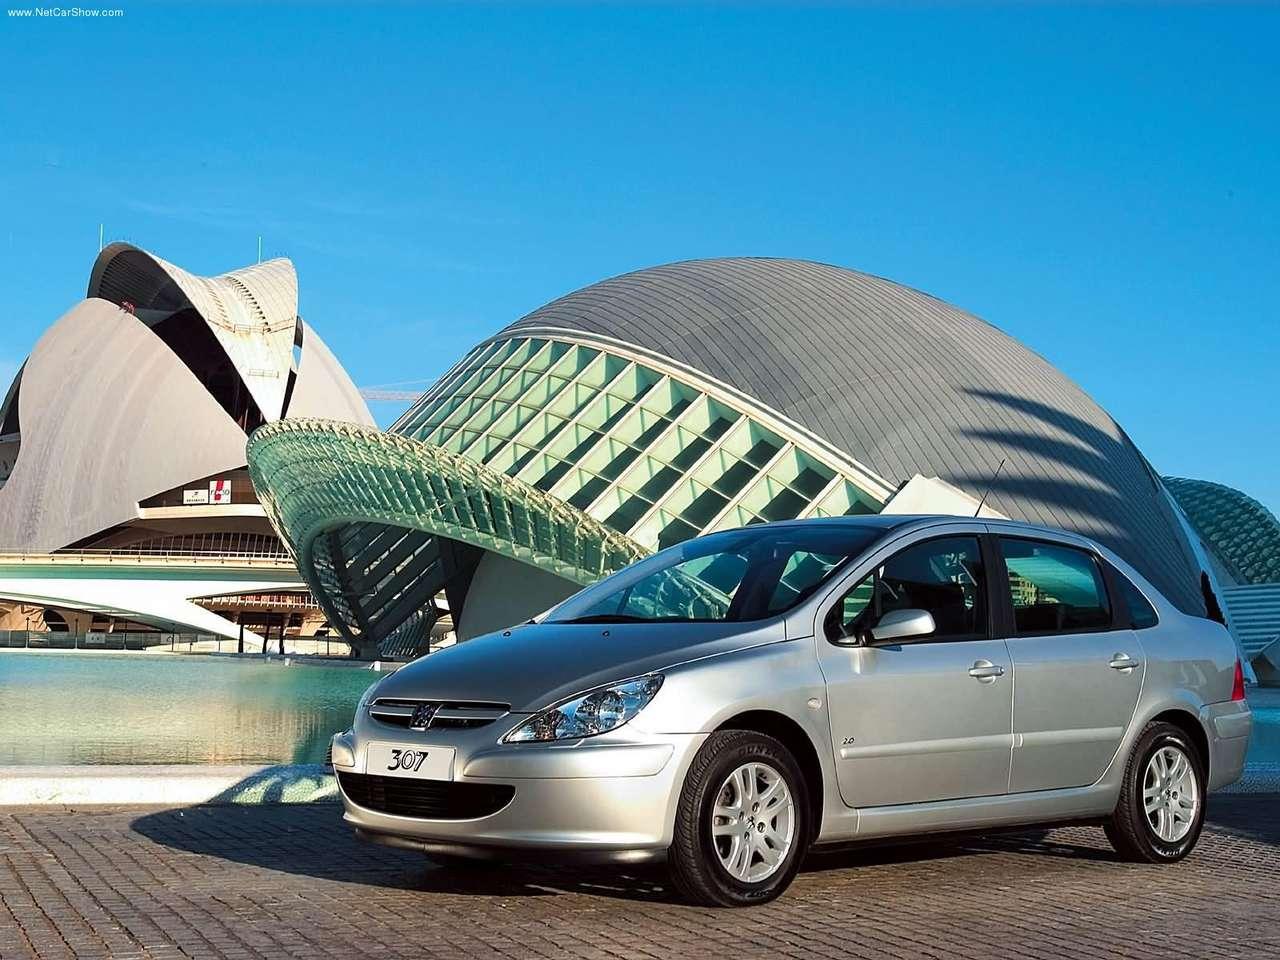 http://2.bp.blogspot.com/_xhqjRo6NERQ/S8Mkf05FqfI/AAAAAAAAH-A/wPykpBr5mB0/s1600/Peugeot-307_Sedan_2.0_2004_1280x960_wallpaper_03.jpg